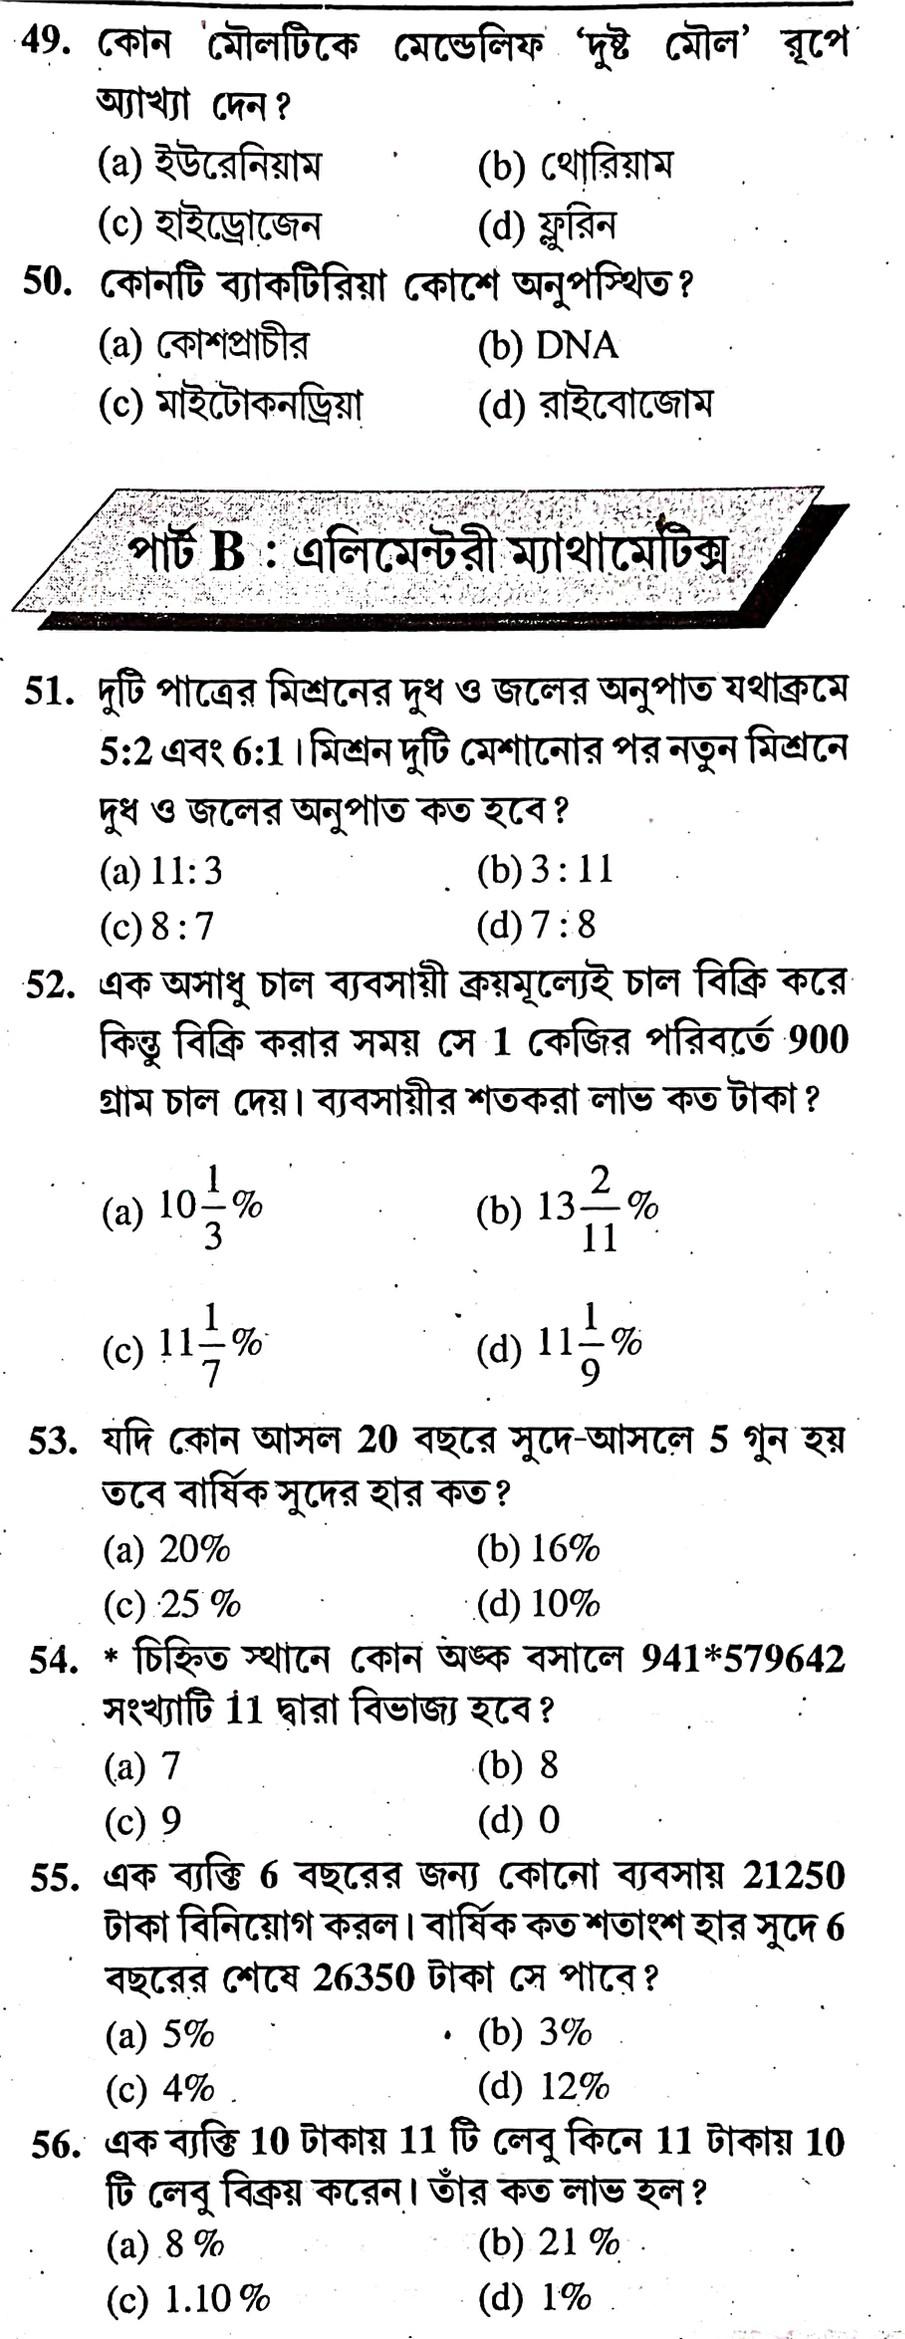 West Bengal Police Constable Preliminary Practice Set - 20 In Bengali    পশ্চিমবঙ্গ পুলিশ কনস্টেবল প্রিলিমিনারী প্র্যাকটিস সেট -২০ - WBCS Notebook